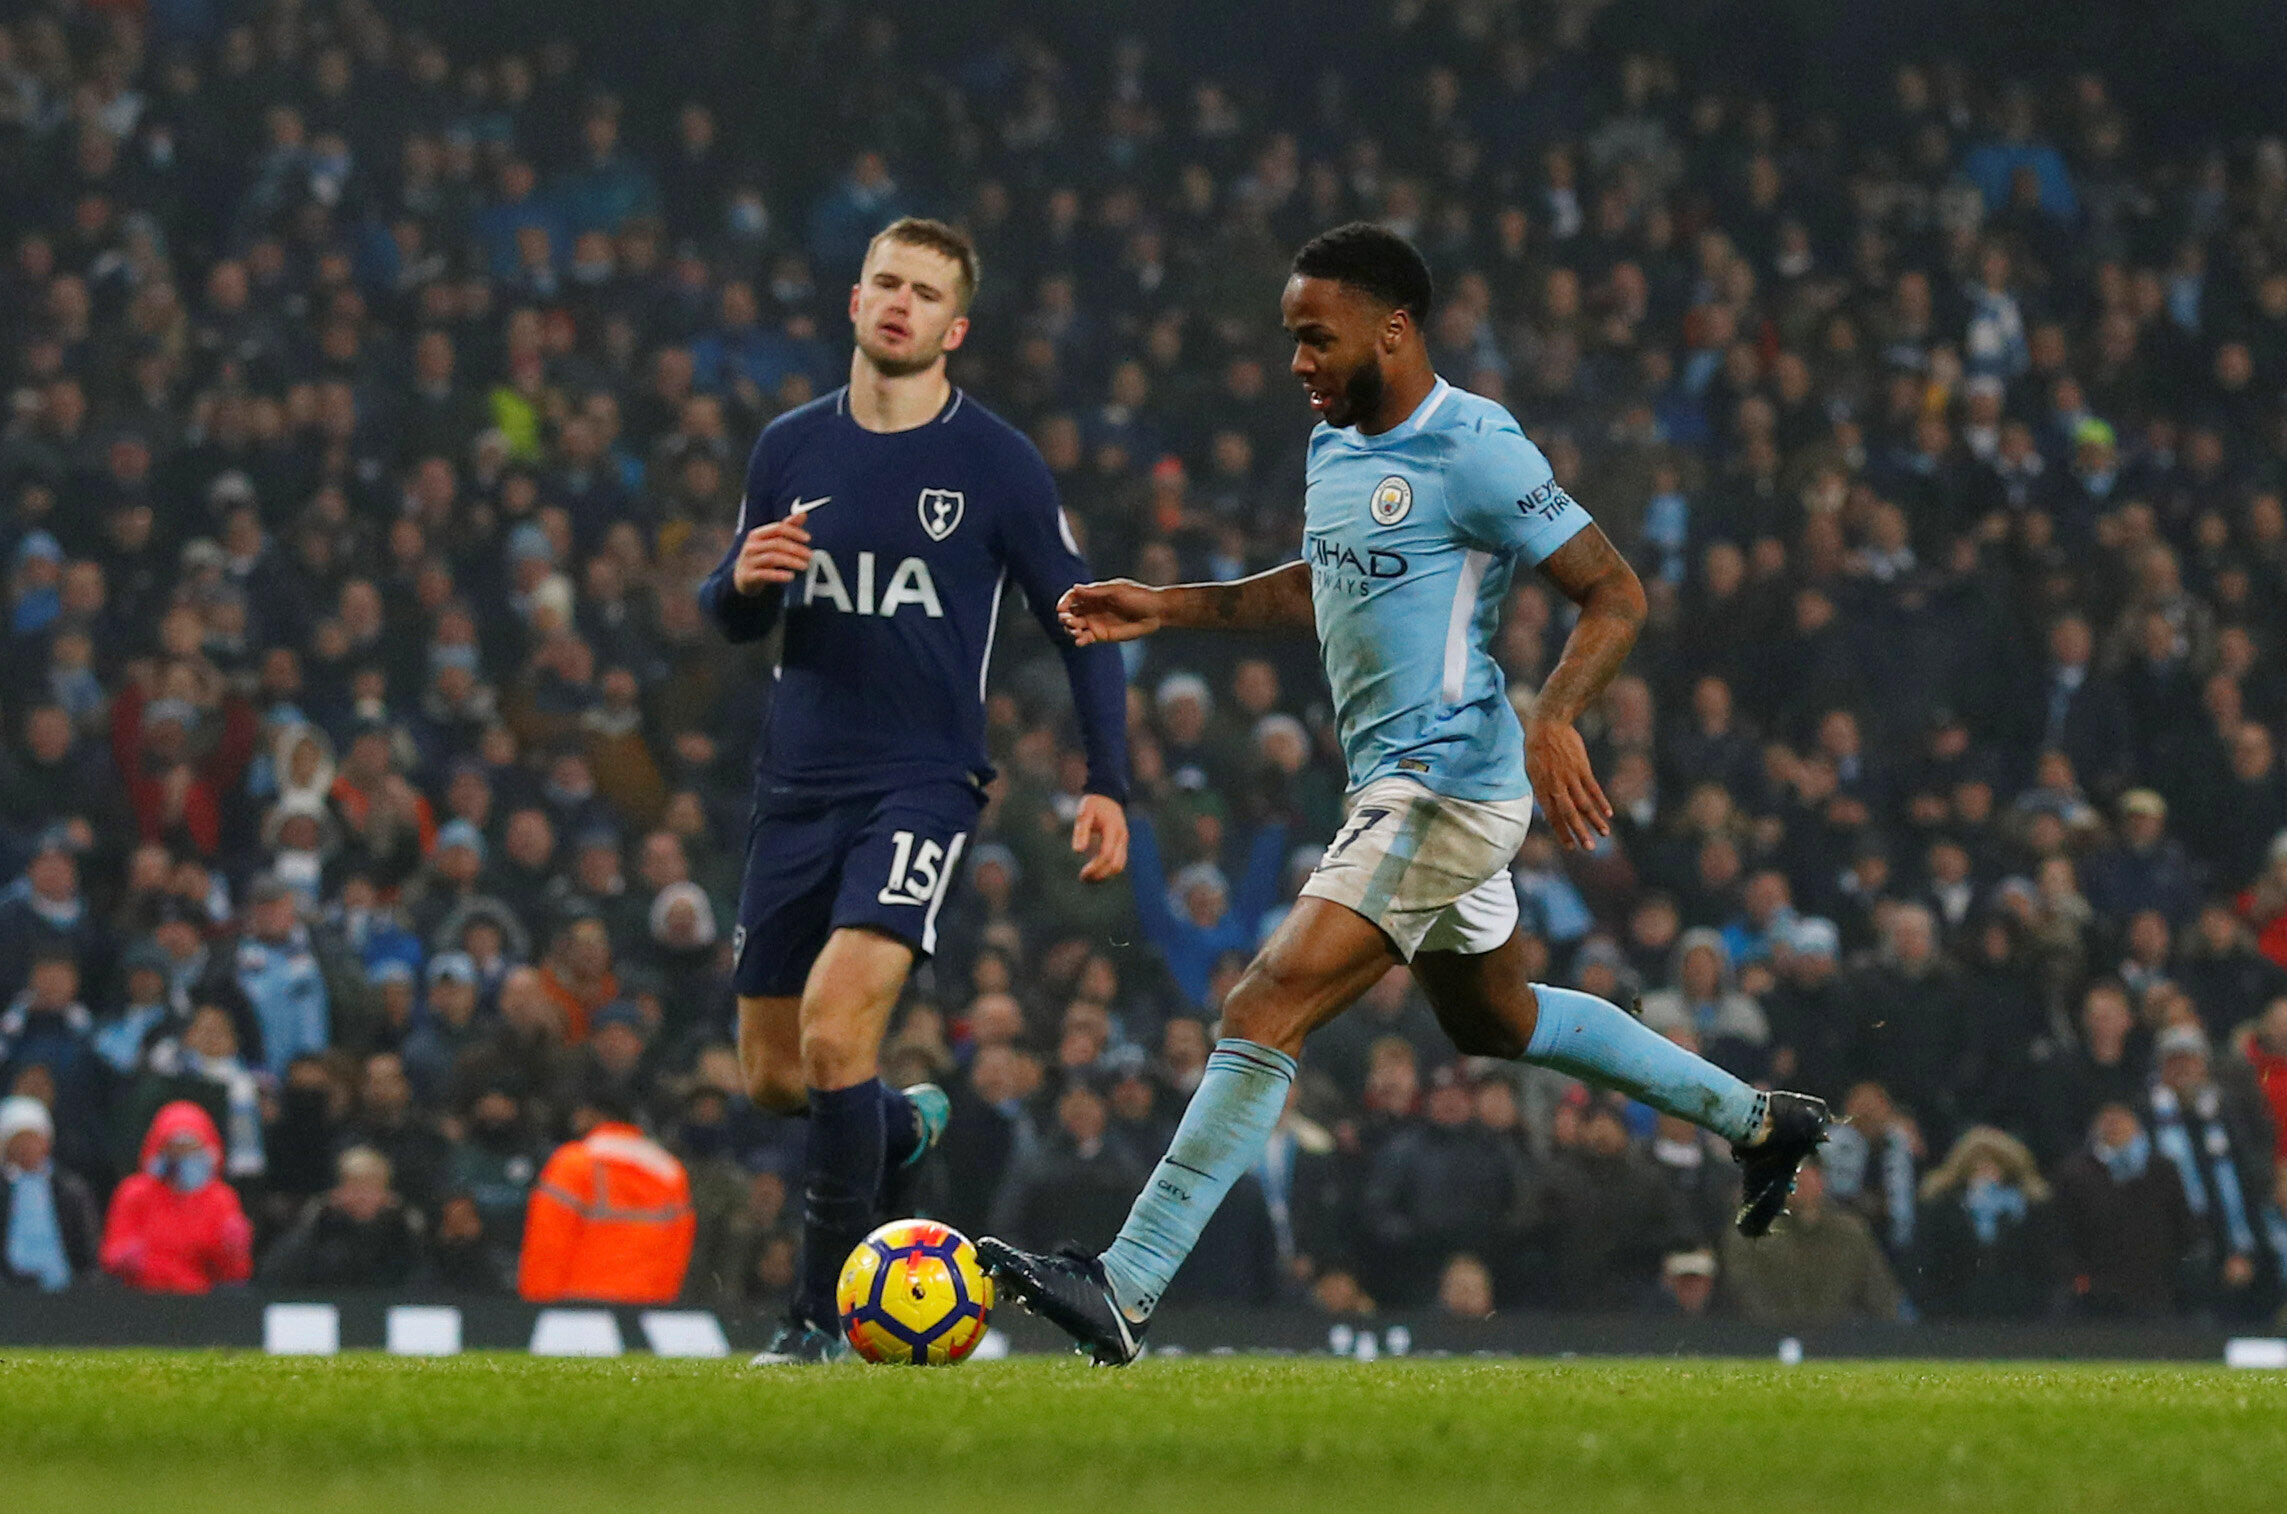 Manchester City's Raheem Sterling scores his team's fourth goal against Tottenham.